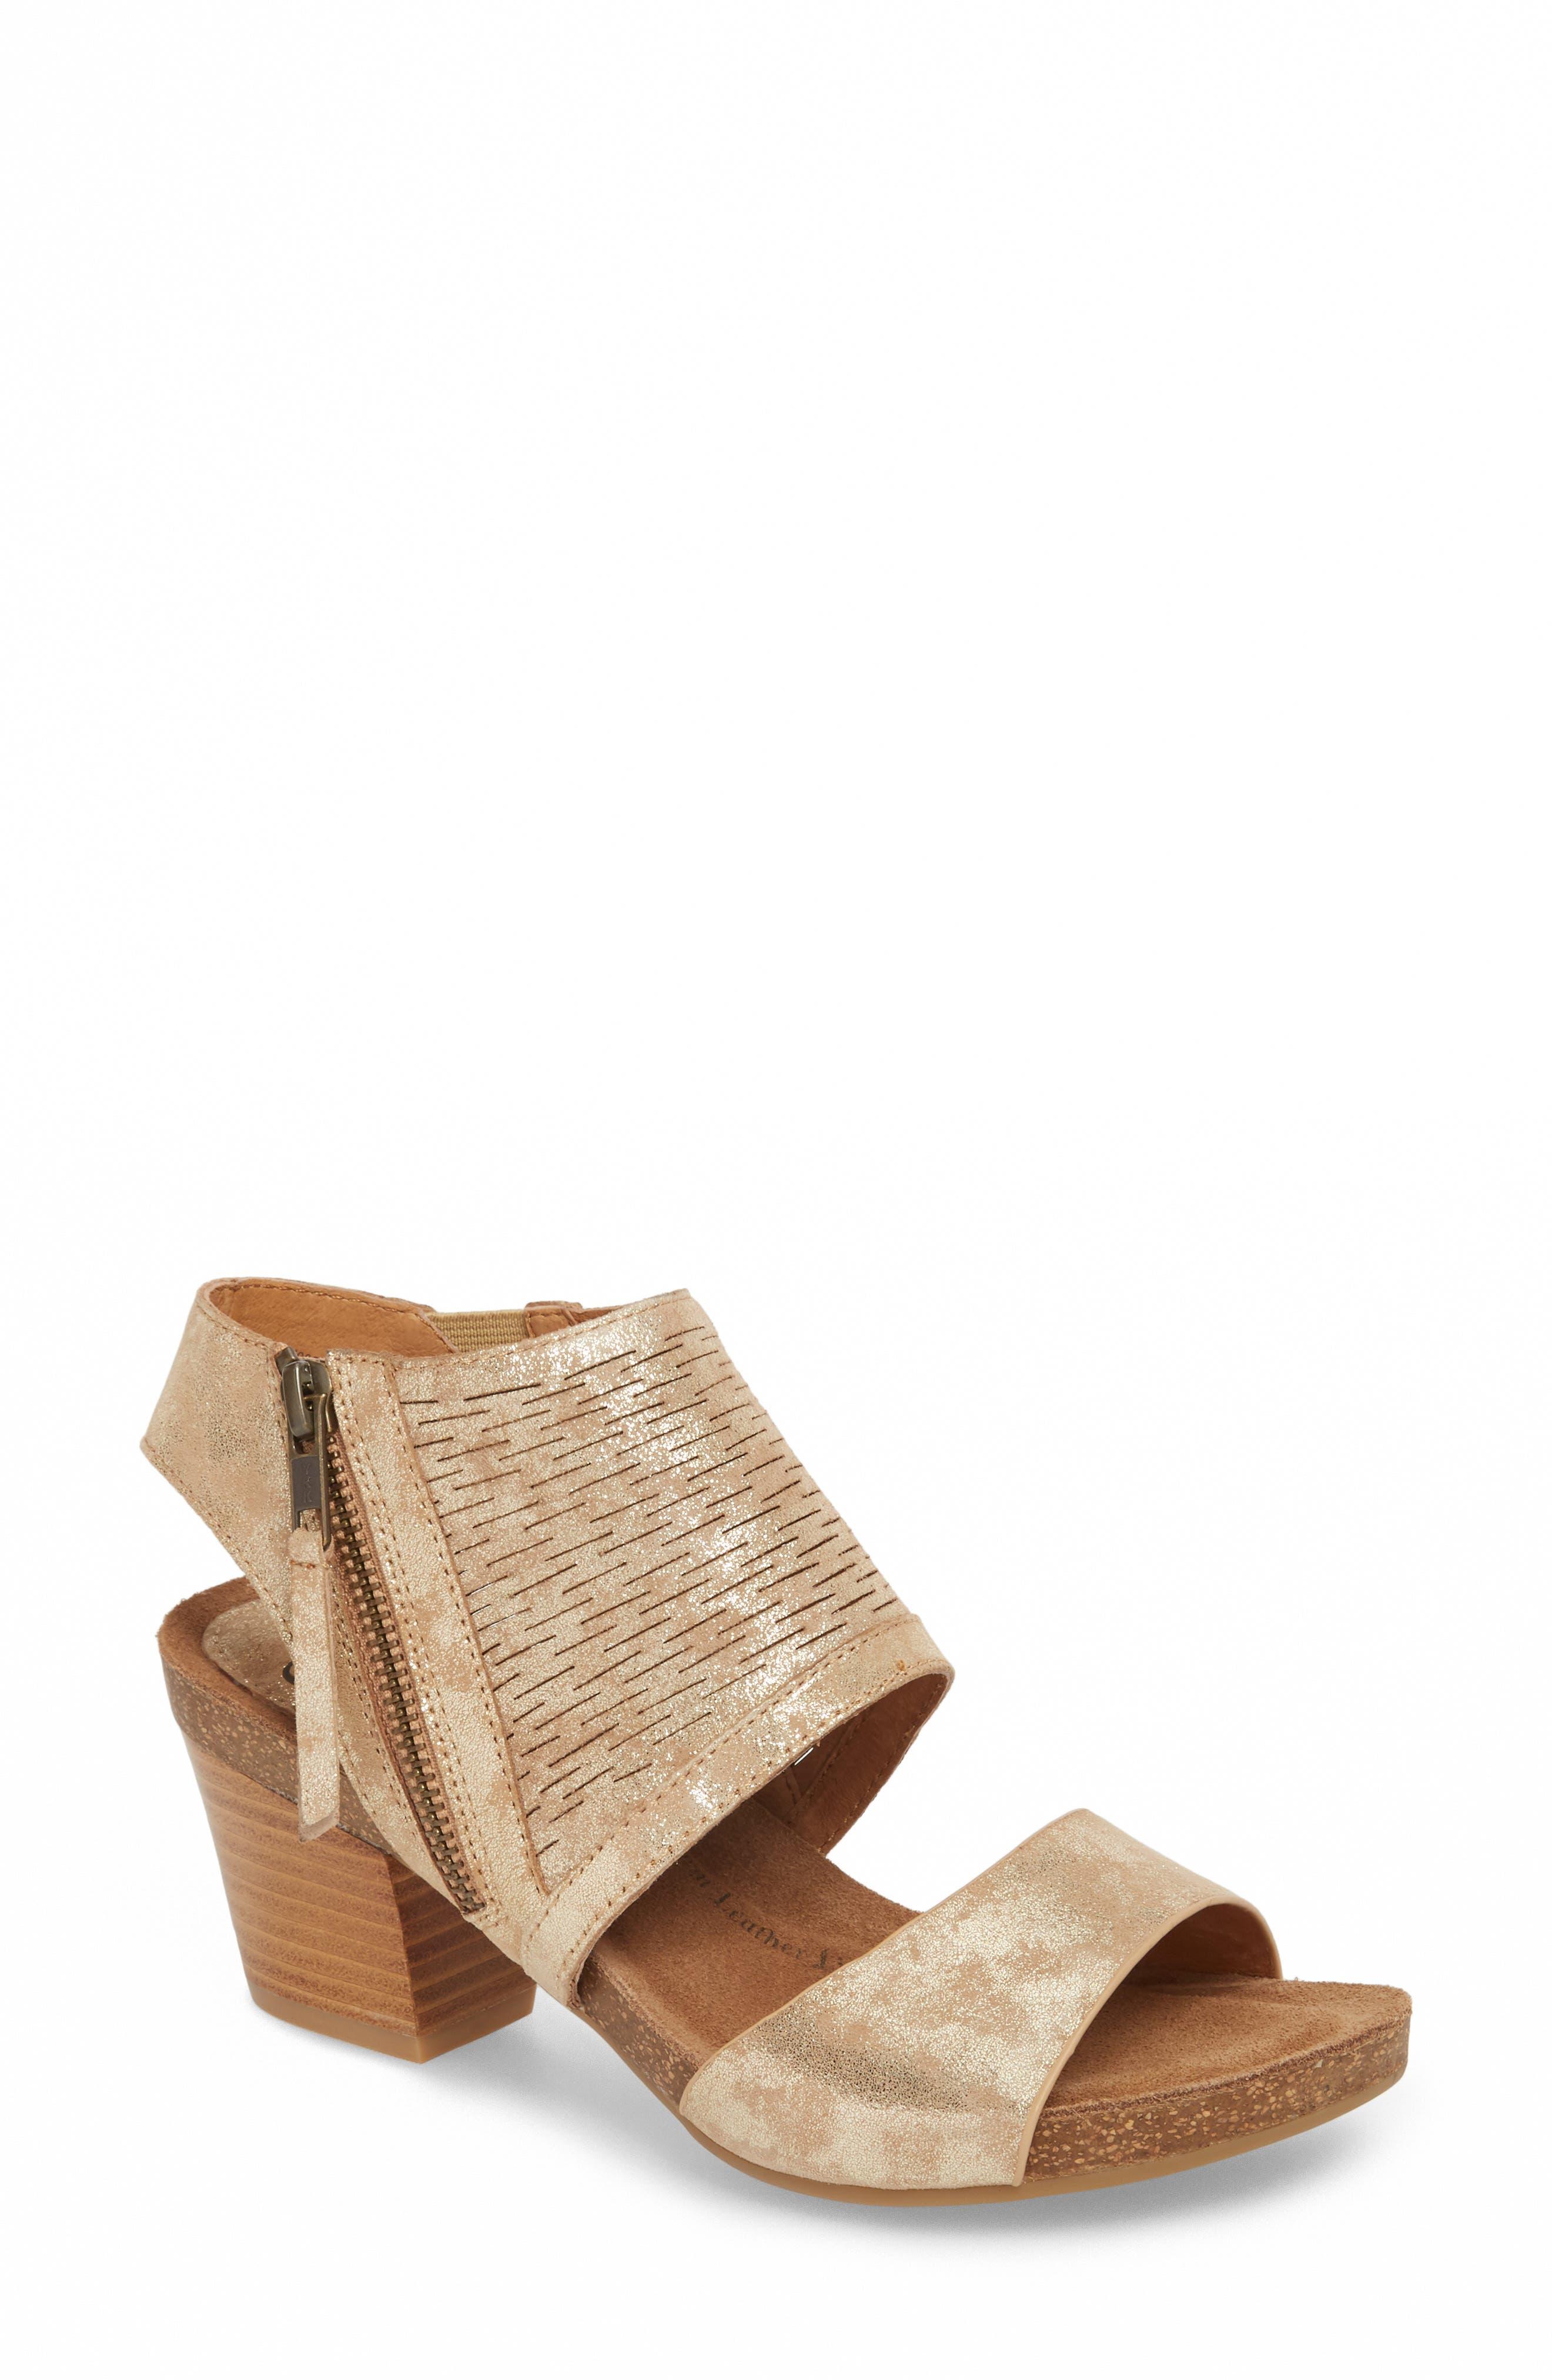 Milan Block Heel Sandal,                             Main thumbnail 1, color,                             Platino Distressed Foil Suede